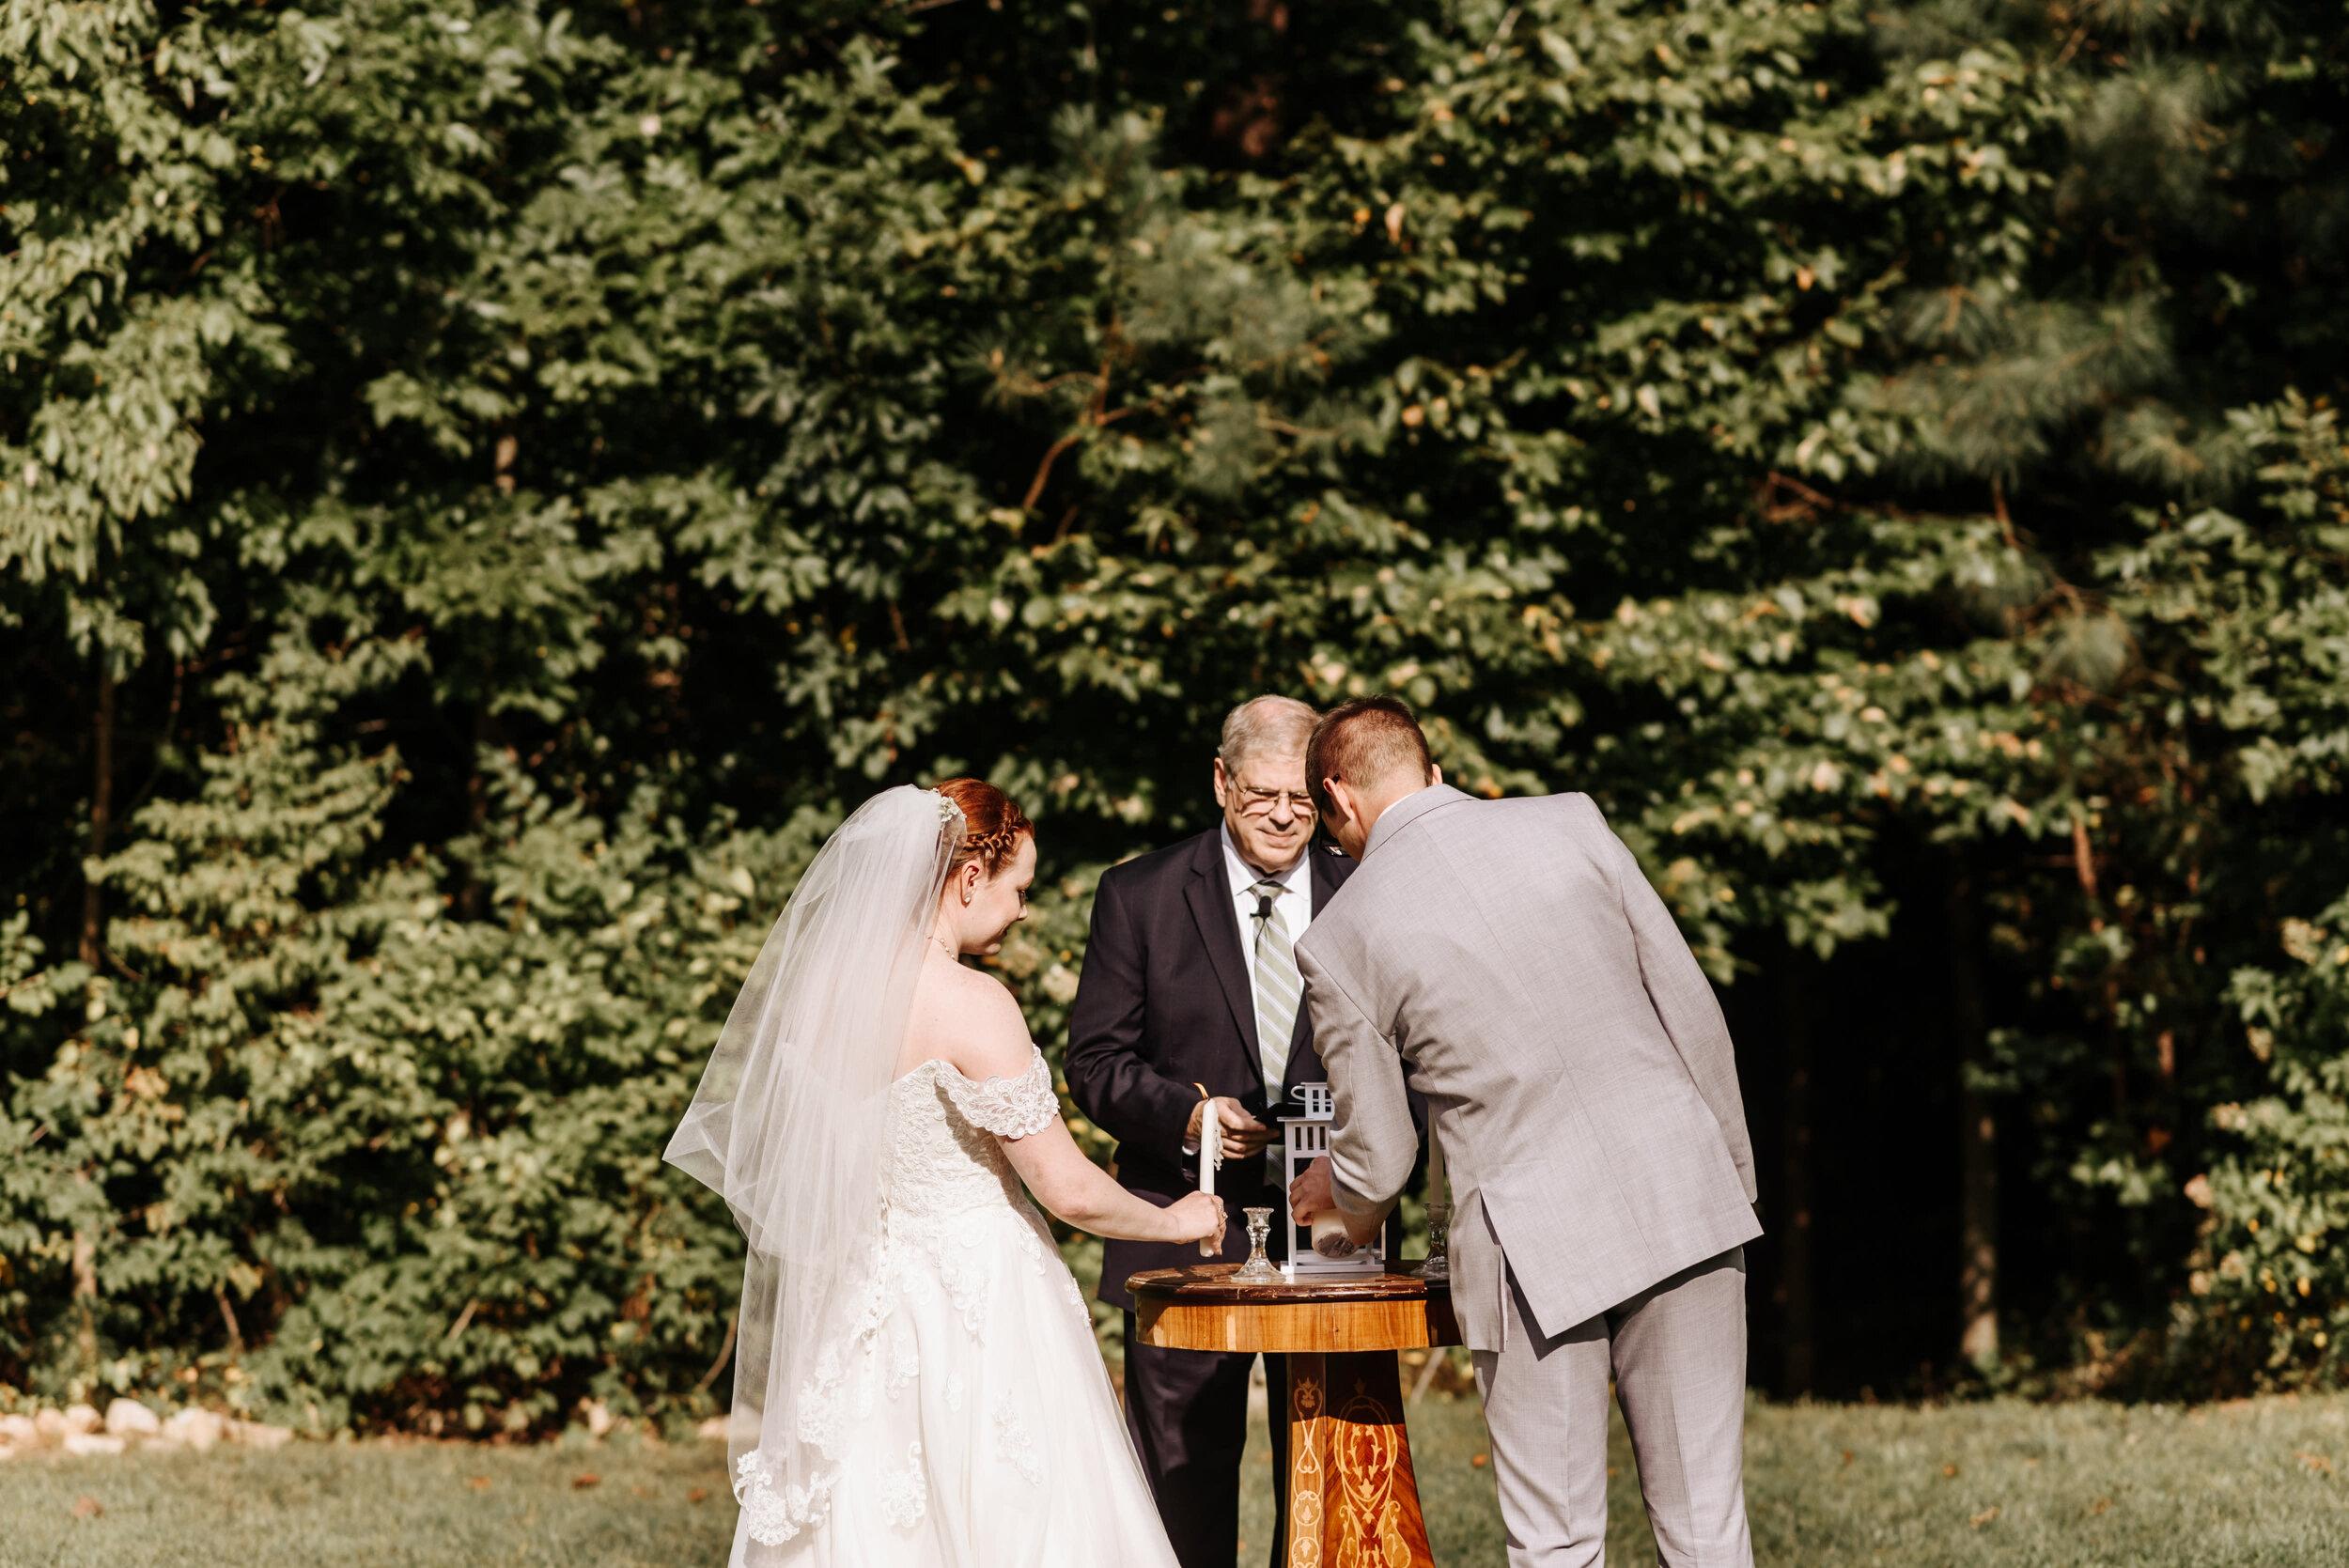 Rachel_David_Wedding_Richmond_Virginia_Photography_by_V_23.jpg